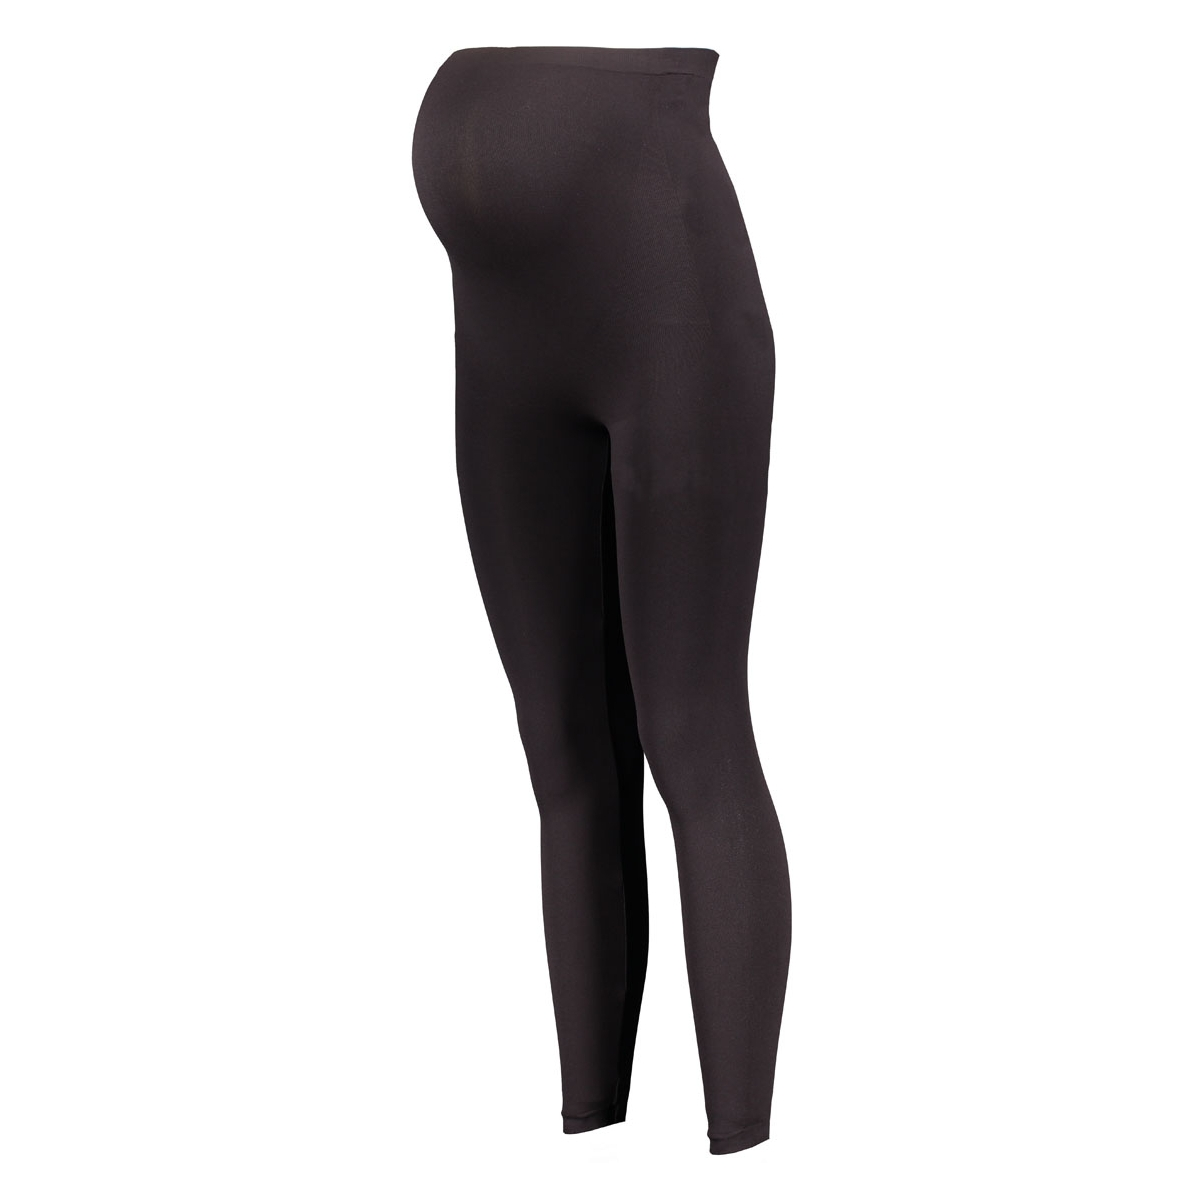 tia jeanne legging 20003331 mama-licious positie broek black